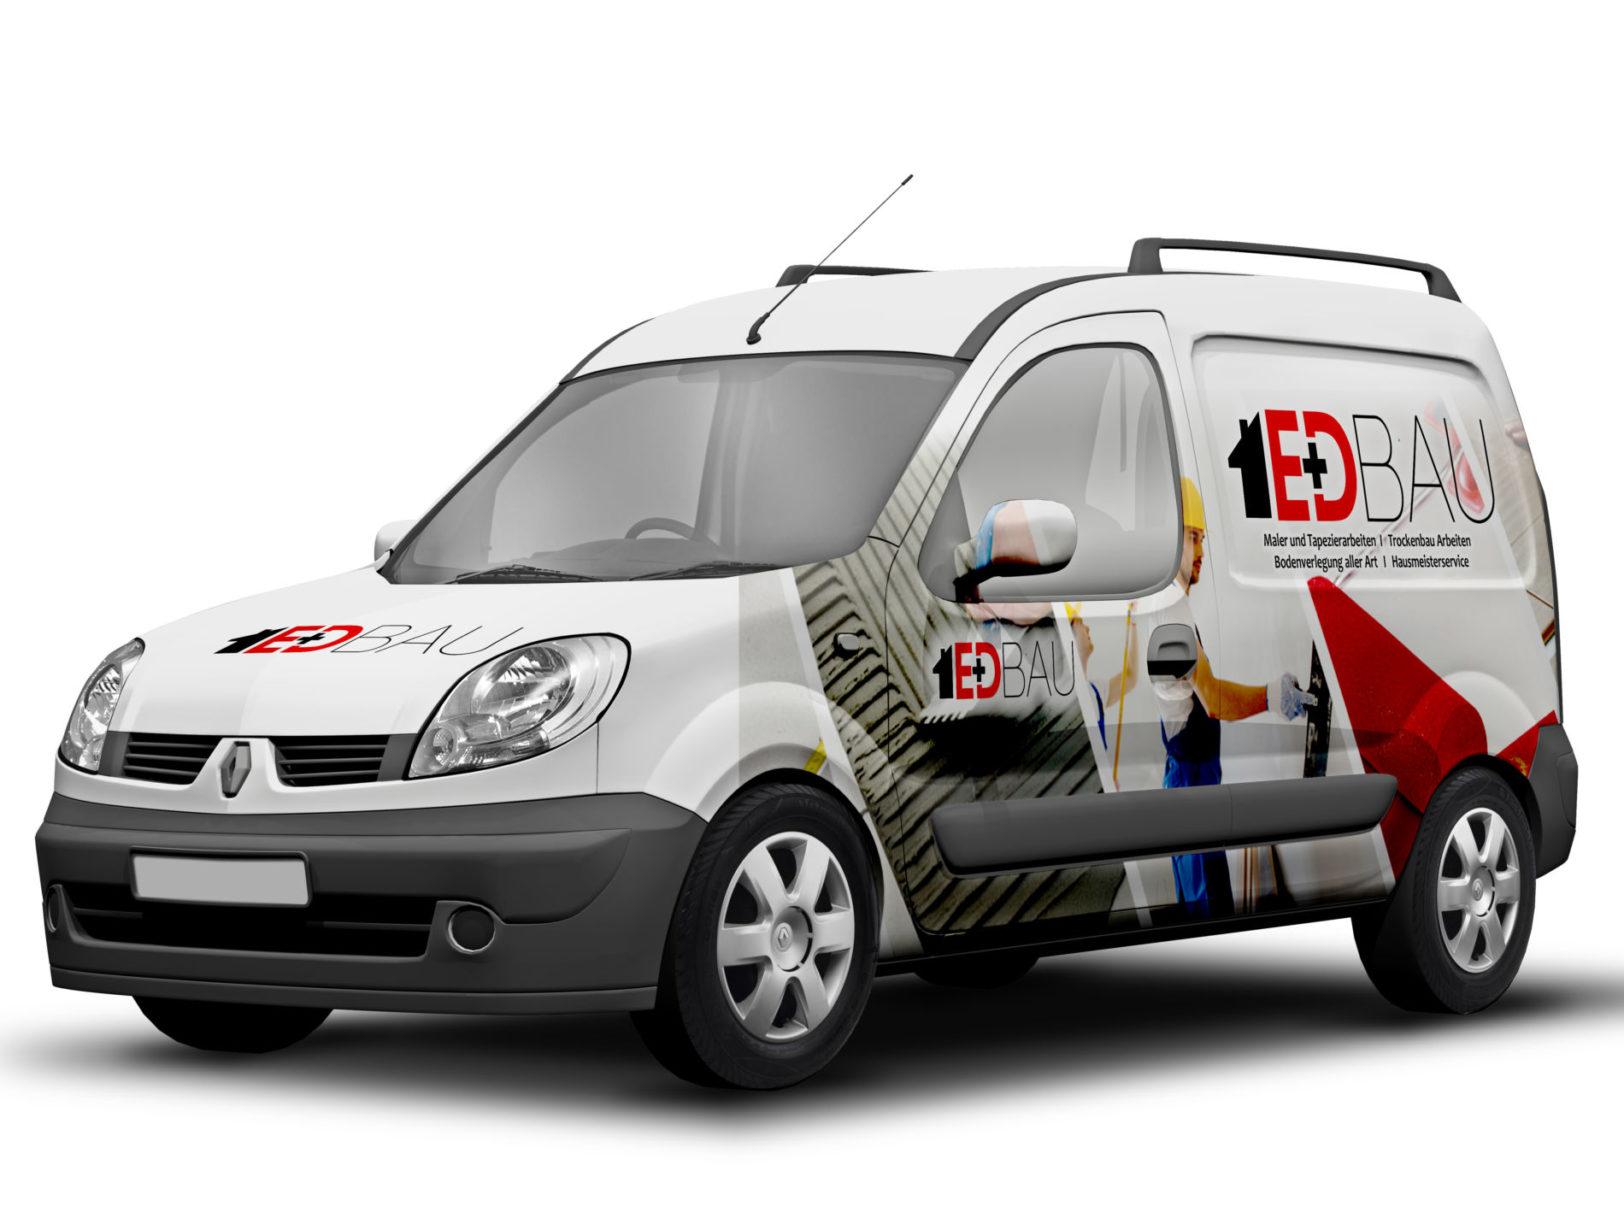 EplusD-Bau-Firmenfahrzeug-beklebung-triumph-agentur